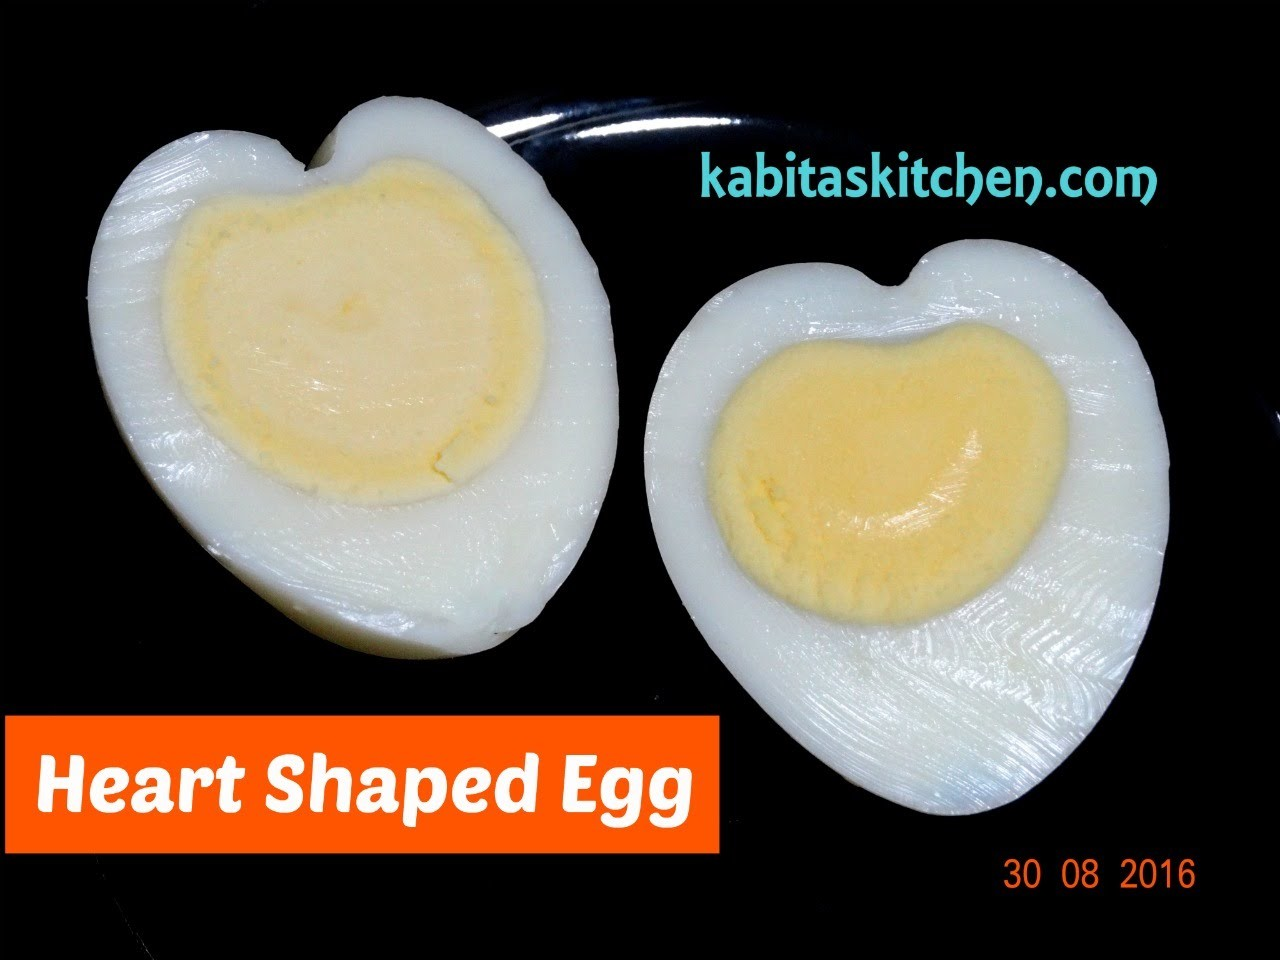 Heart Shaped Boiled Egg | How to Make Heart Shaped Egg | Useful Trick by Kabitaskitchen